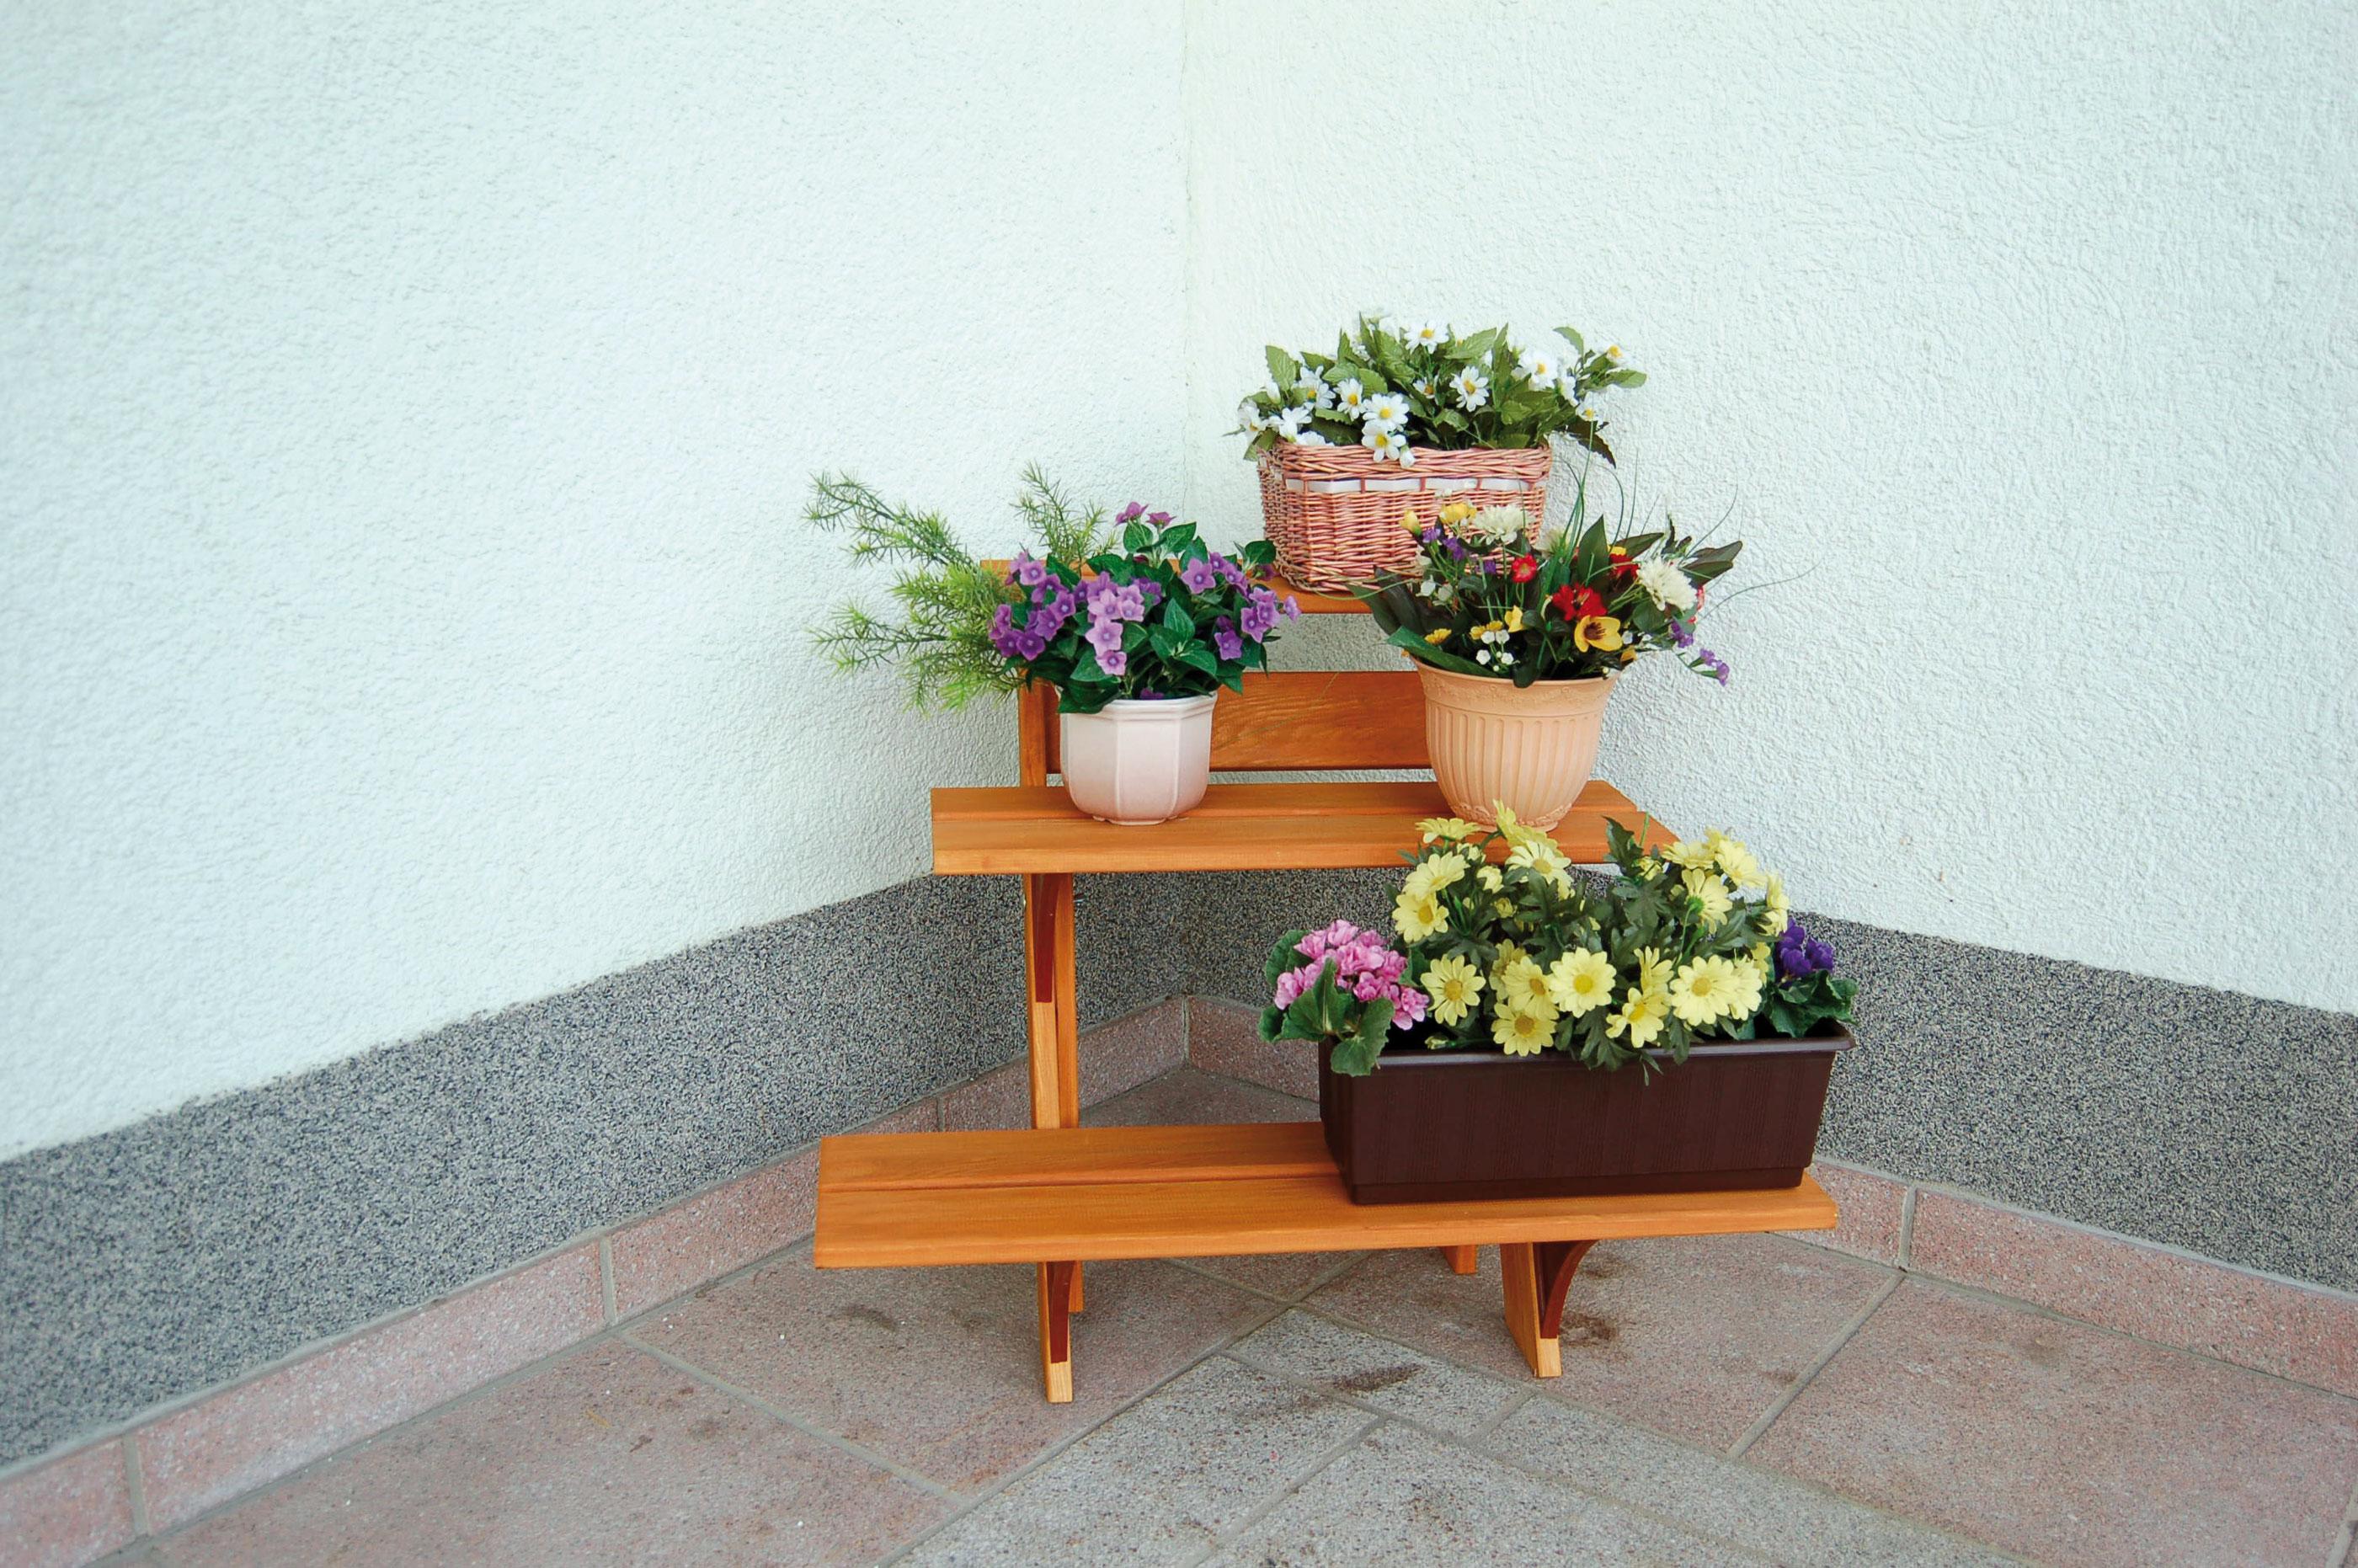 Blumentreppe Flora 3-stufig 55x56x60cm Bild 1